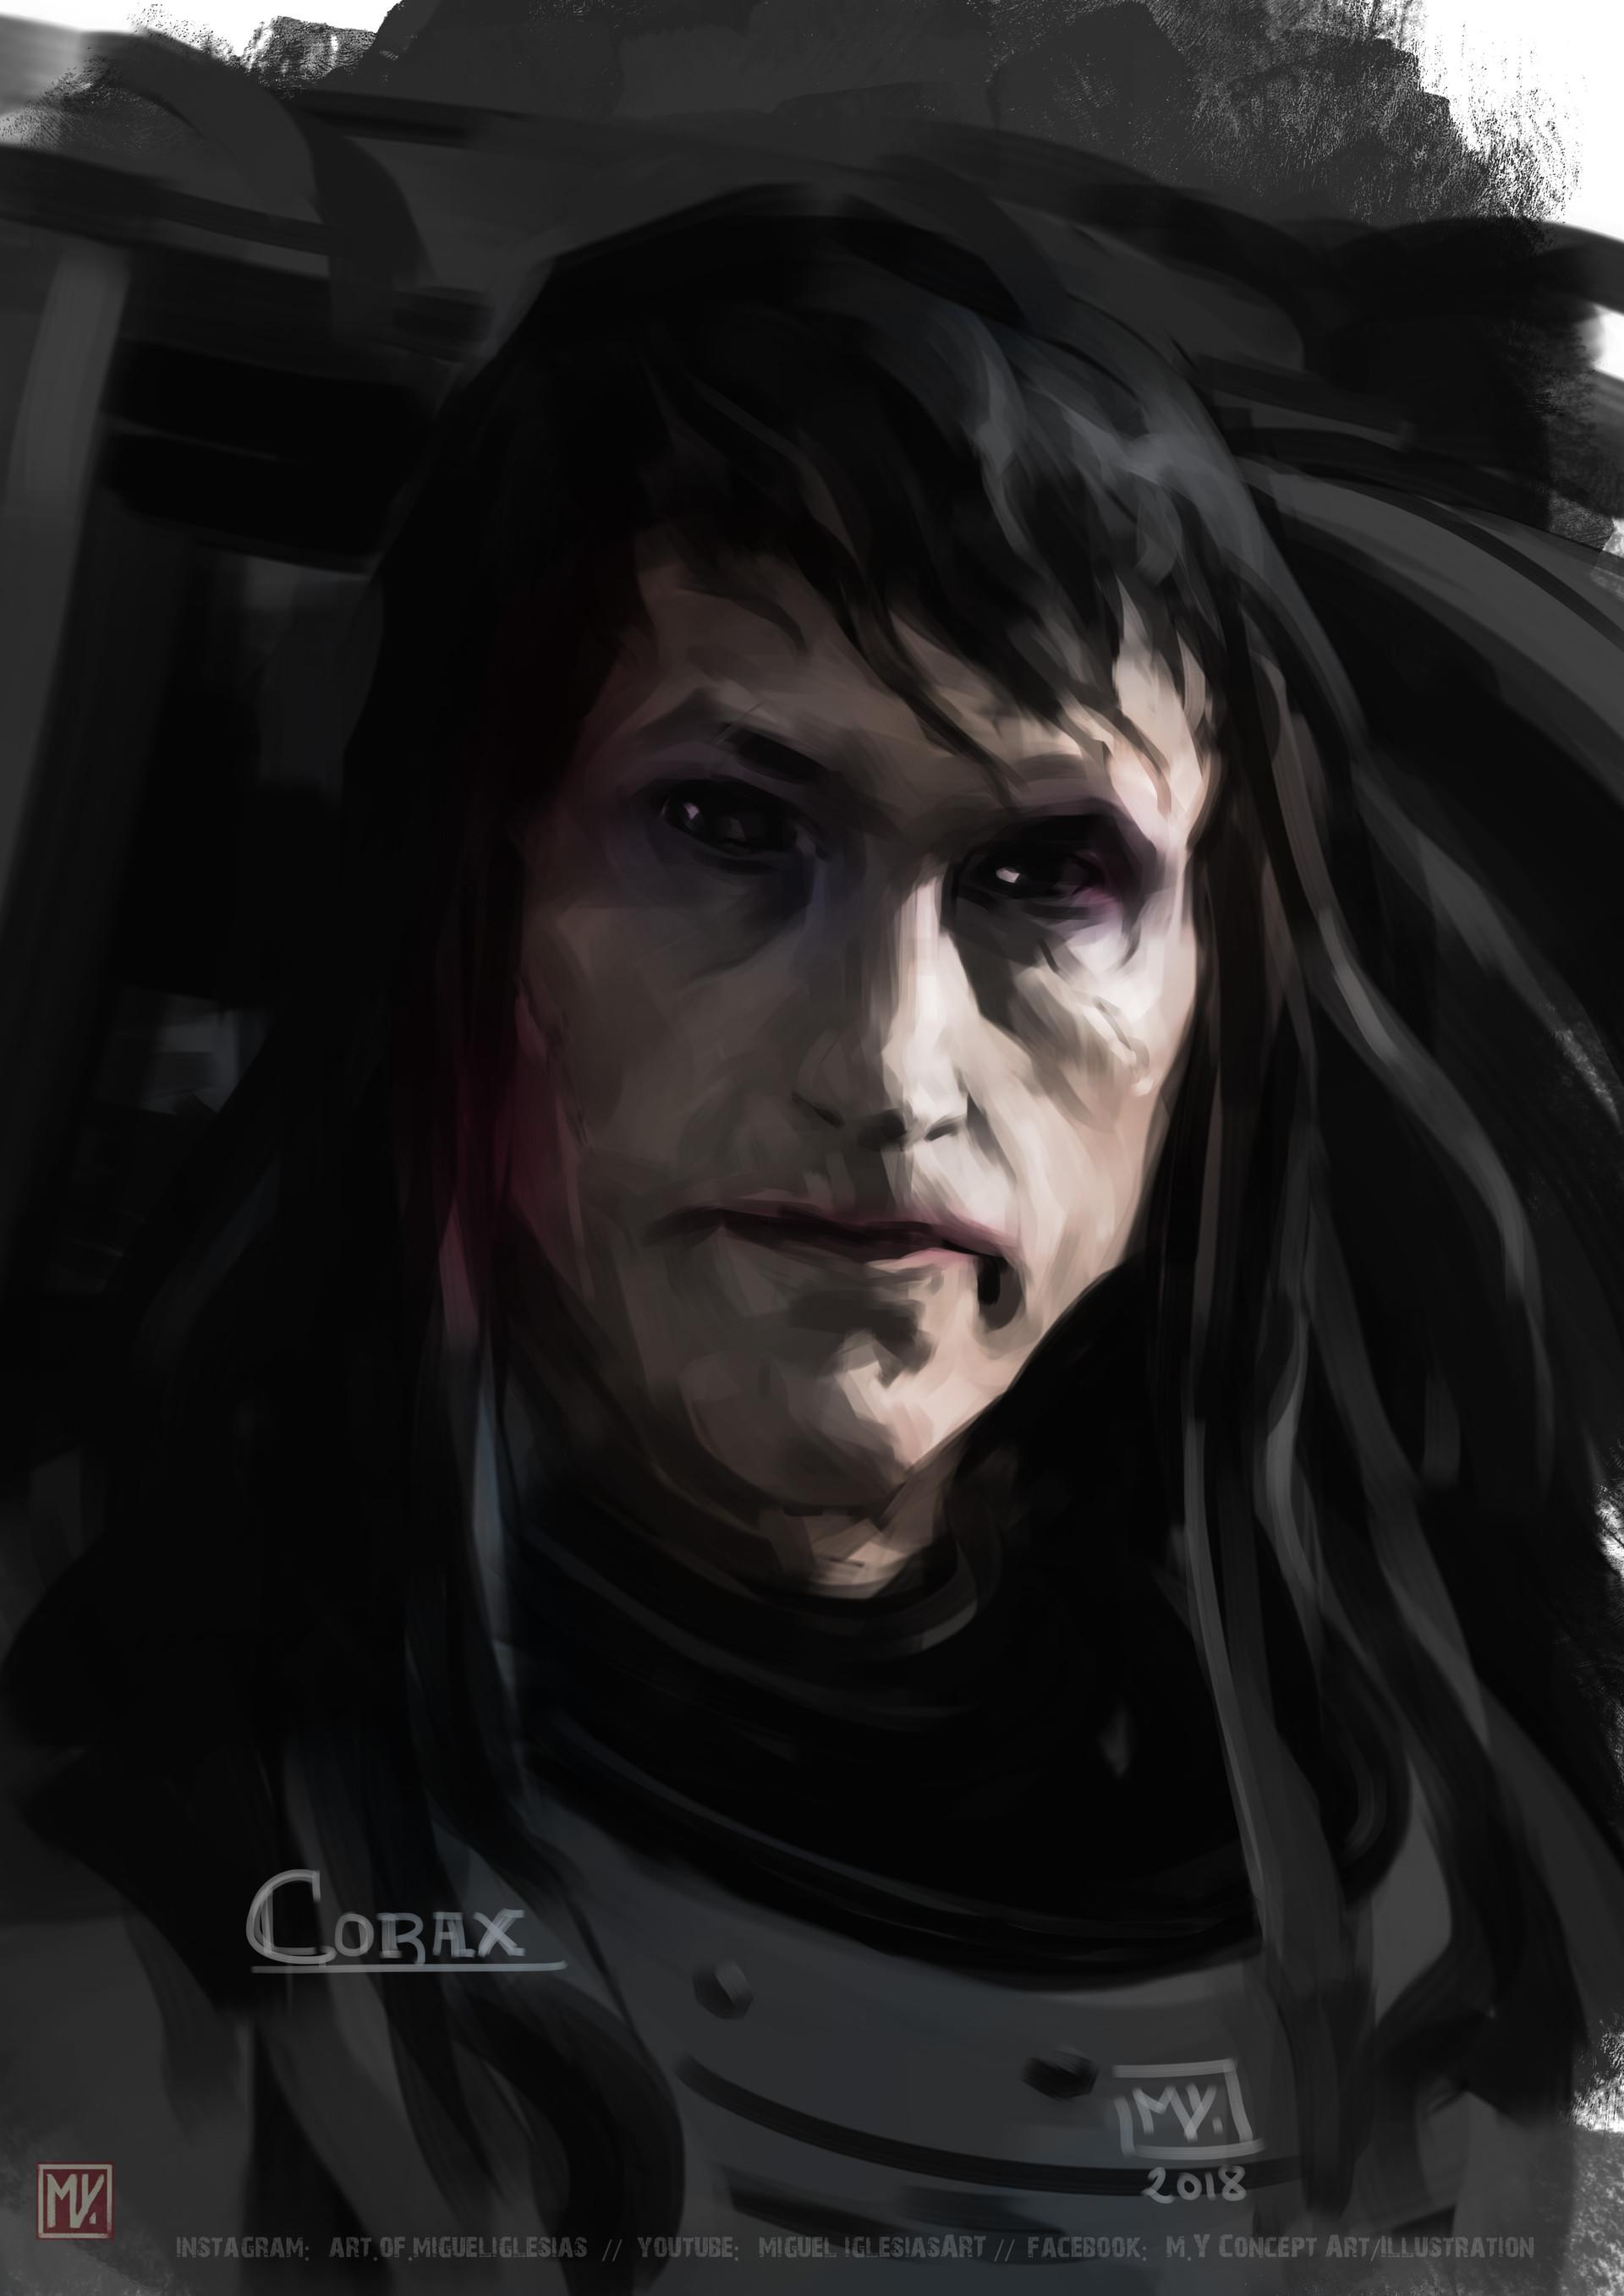 18 - XsQ6Ggc - Corvus Corax, Primarch of the Raven Guard